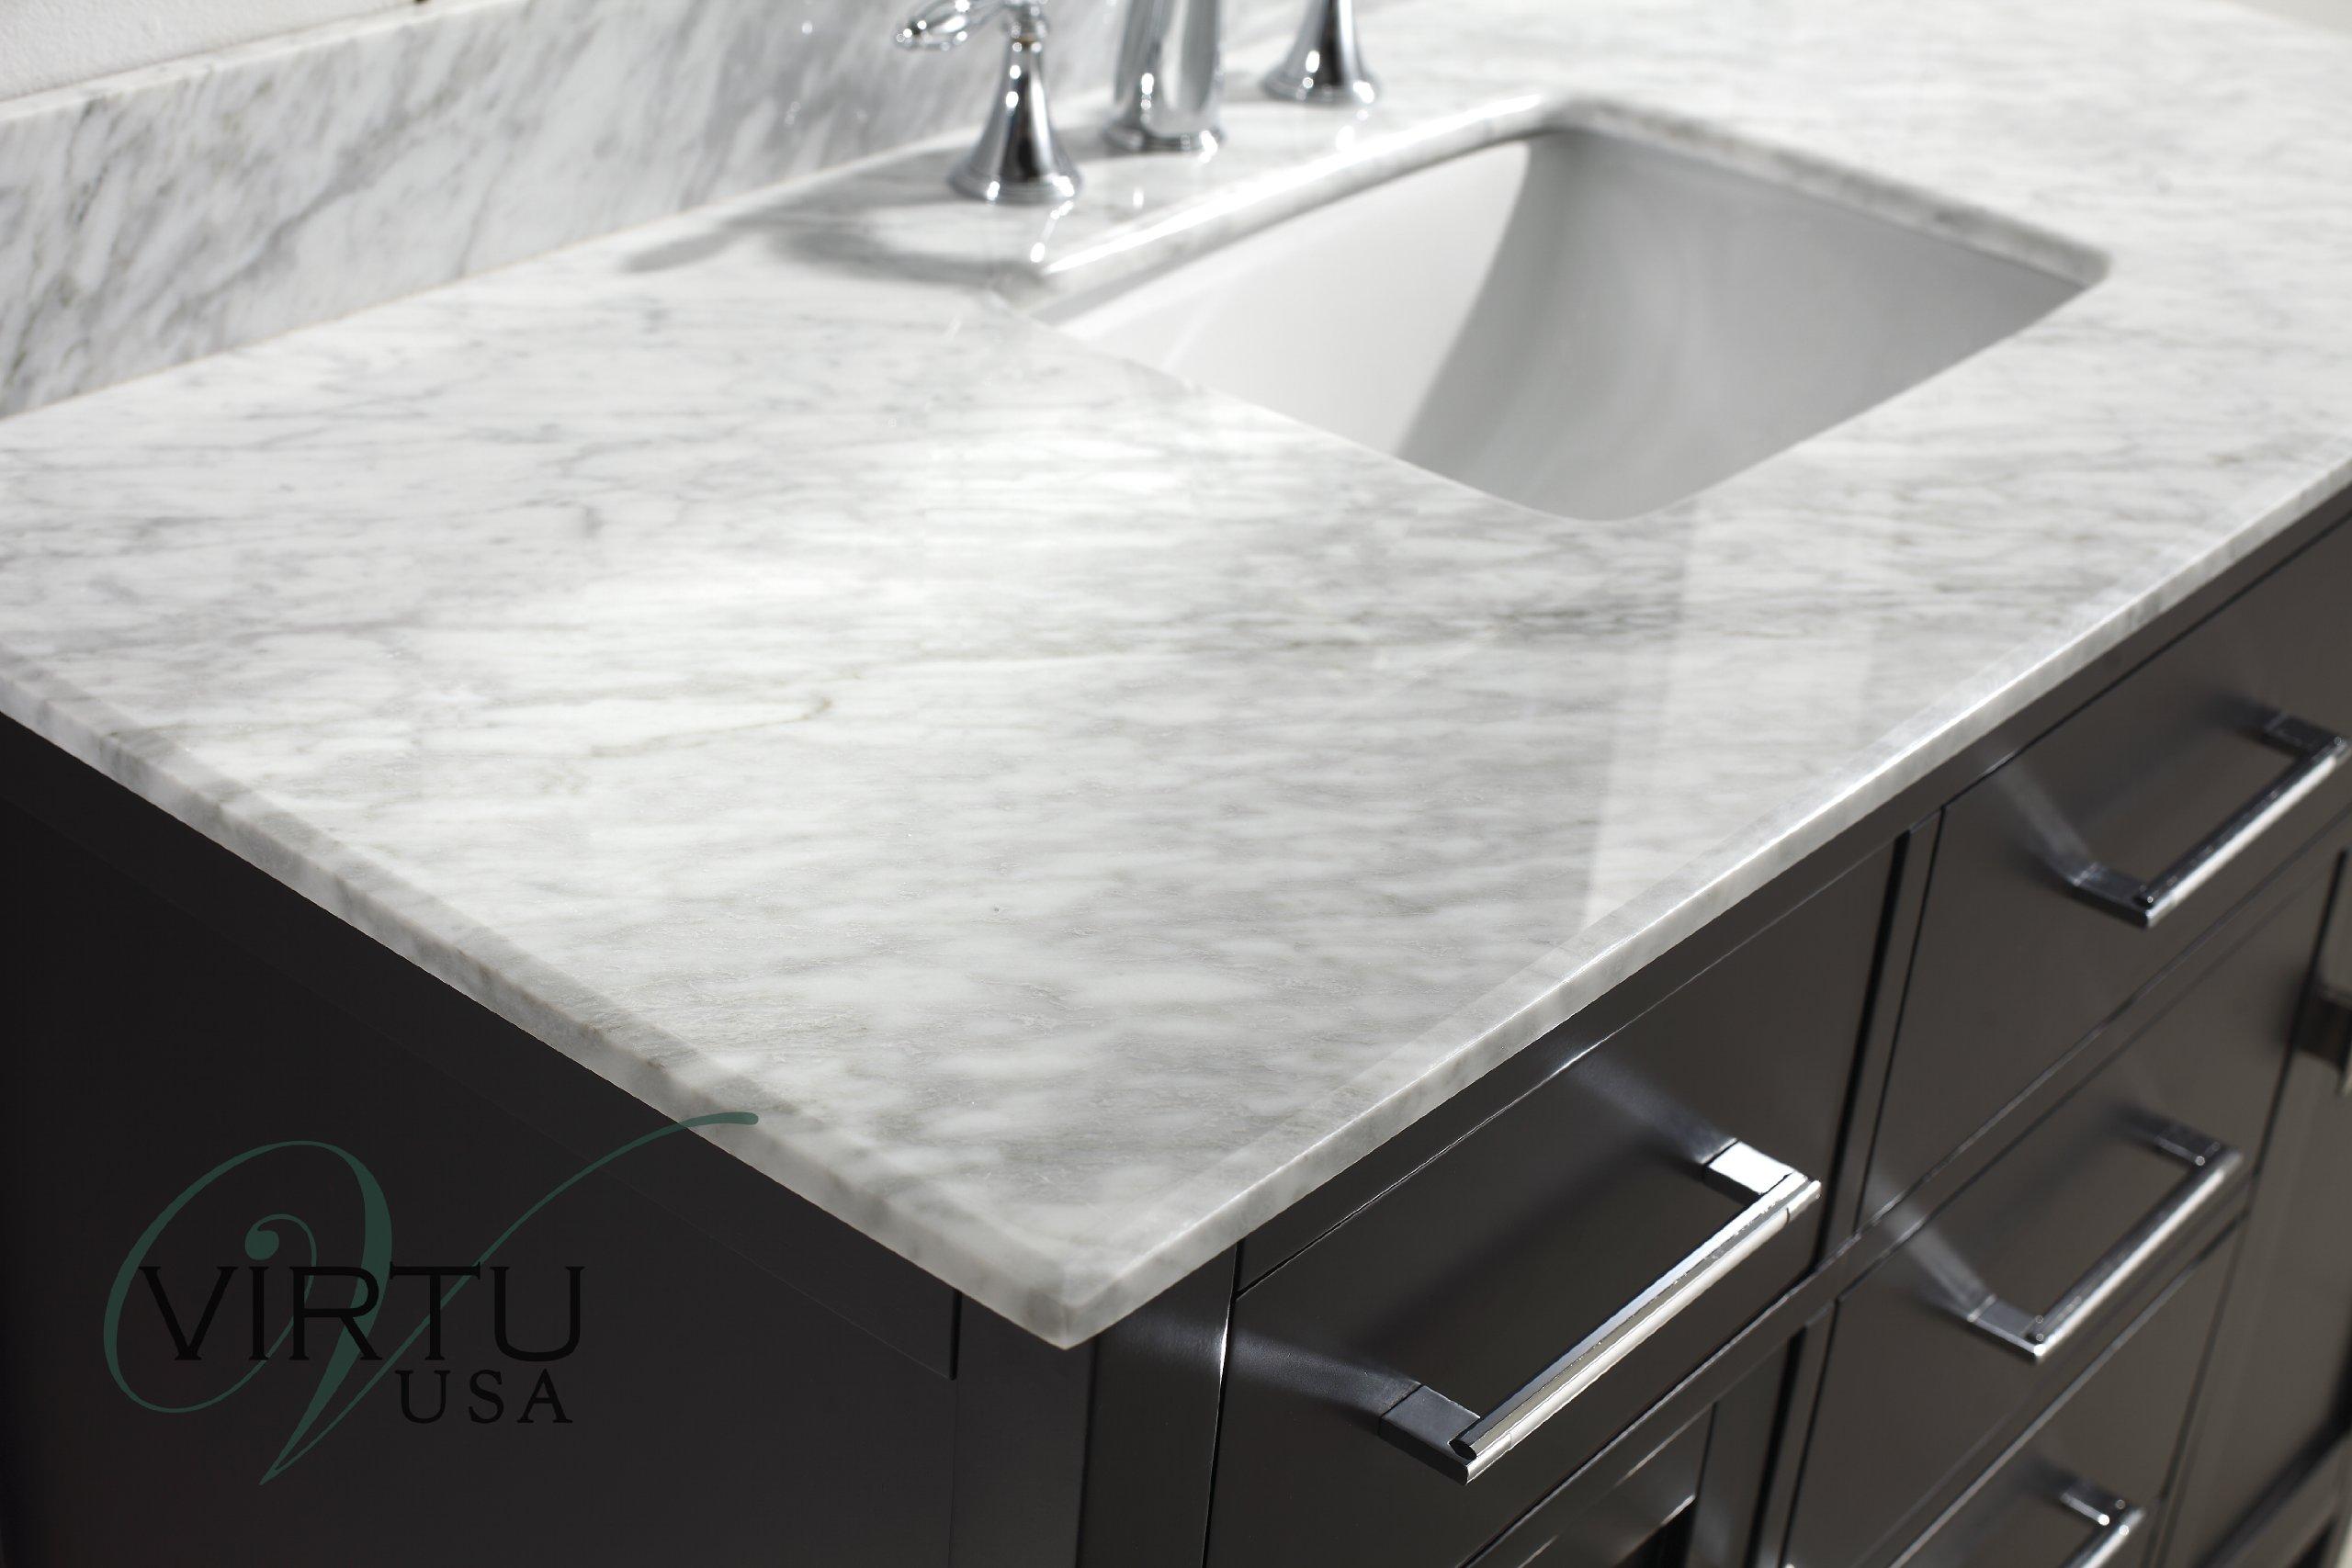 Virtu USA MS-2048-WMSQ-ES Caroline 48-Inch Bathroom Vanity with Single Square Sink in Espresso with Italian Carrera Marble Countertop